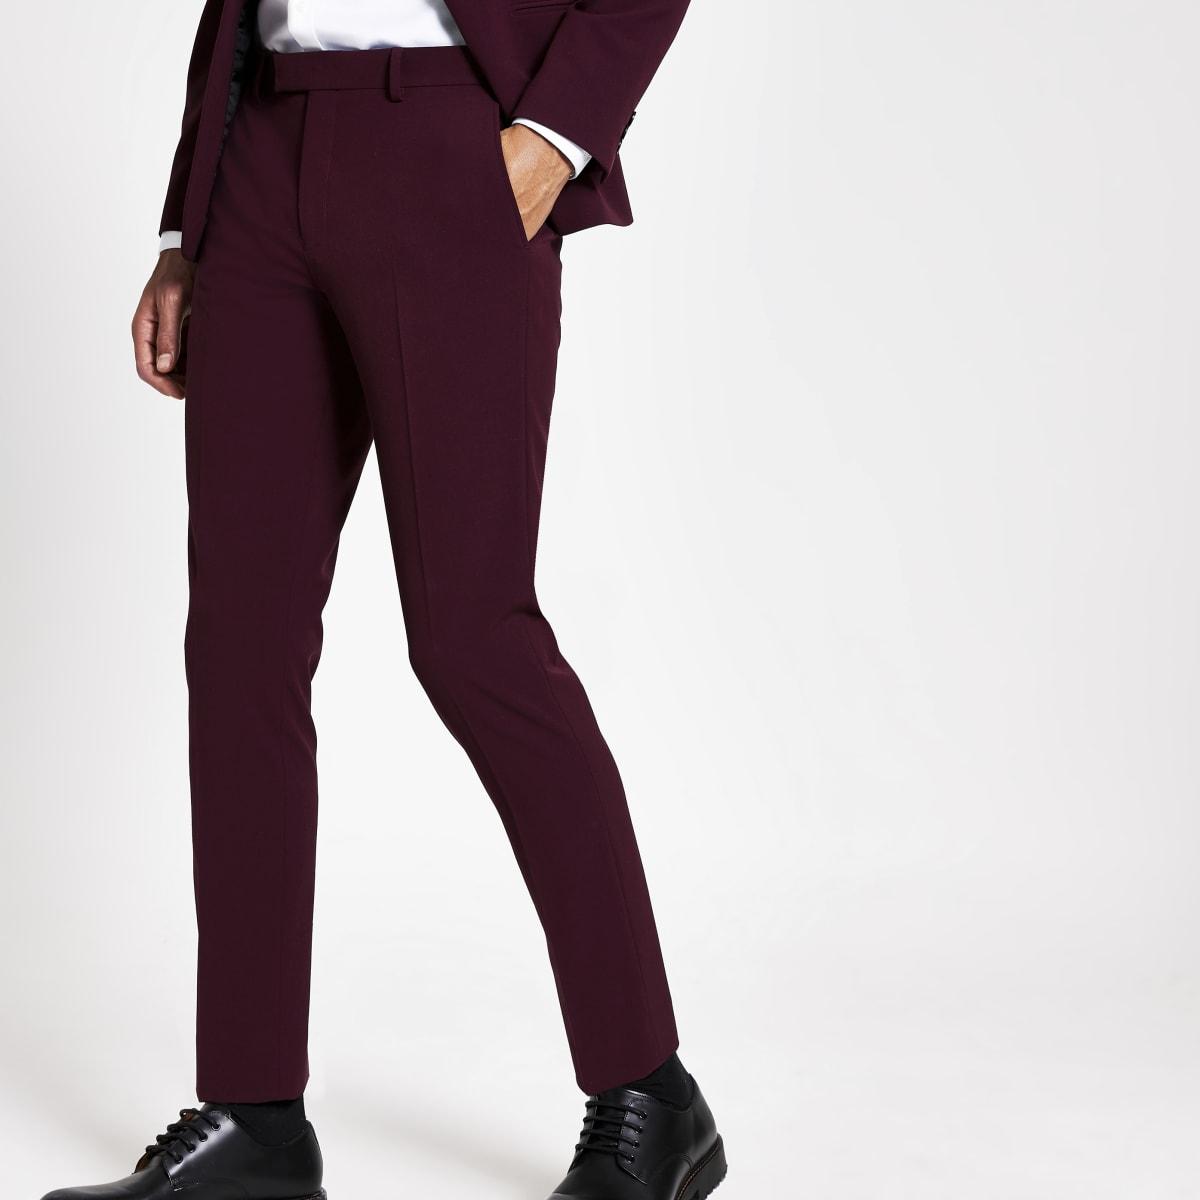 Pantalon de costume skinny stretch rouge foncé